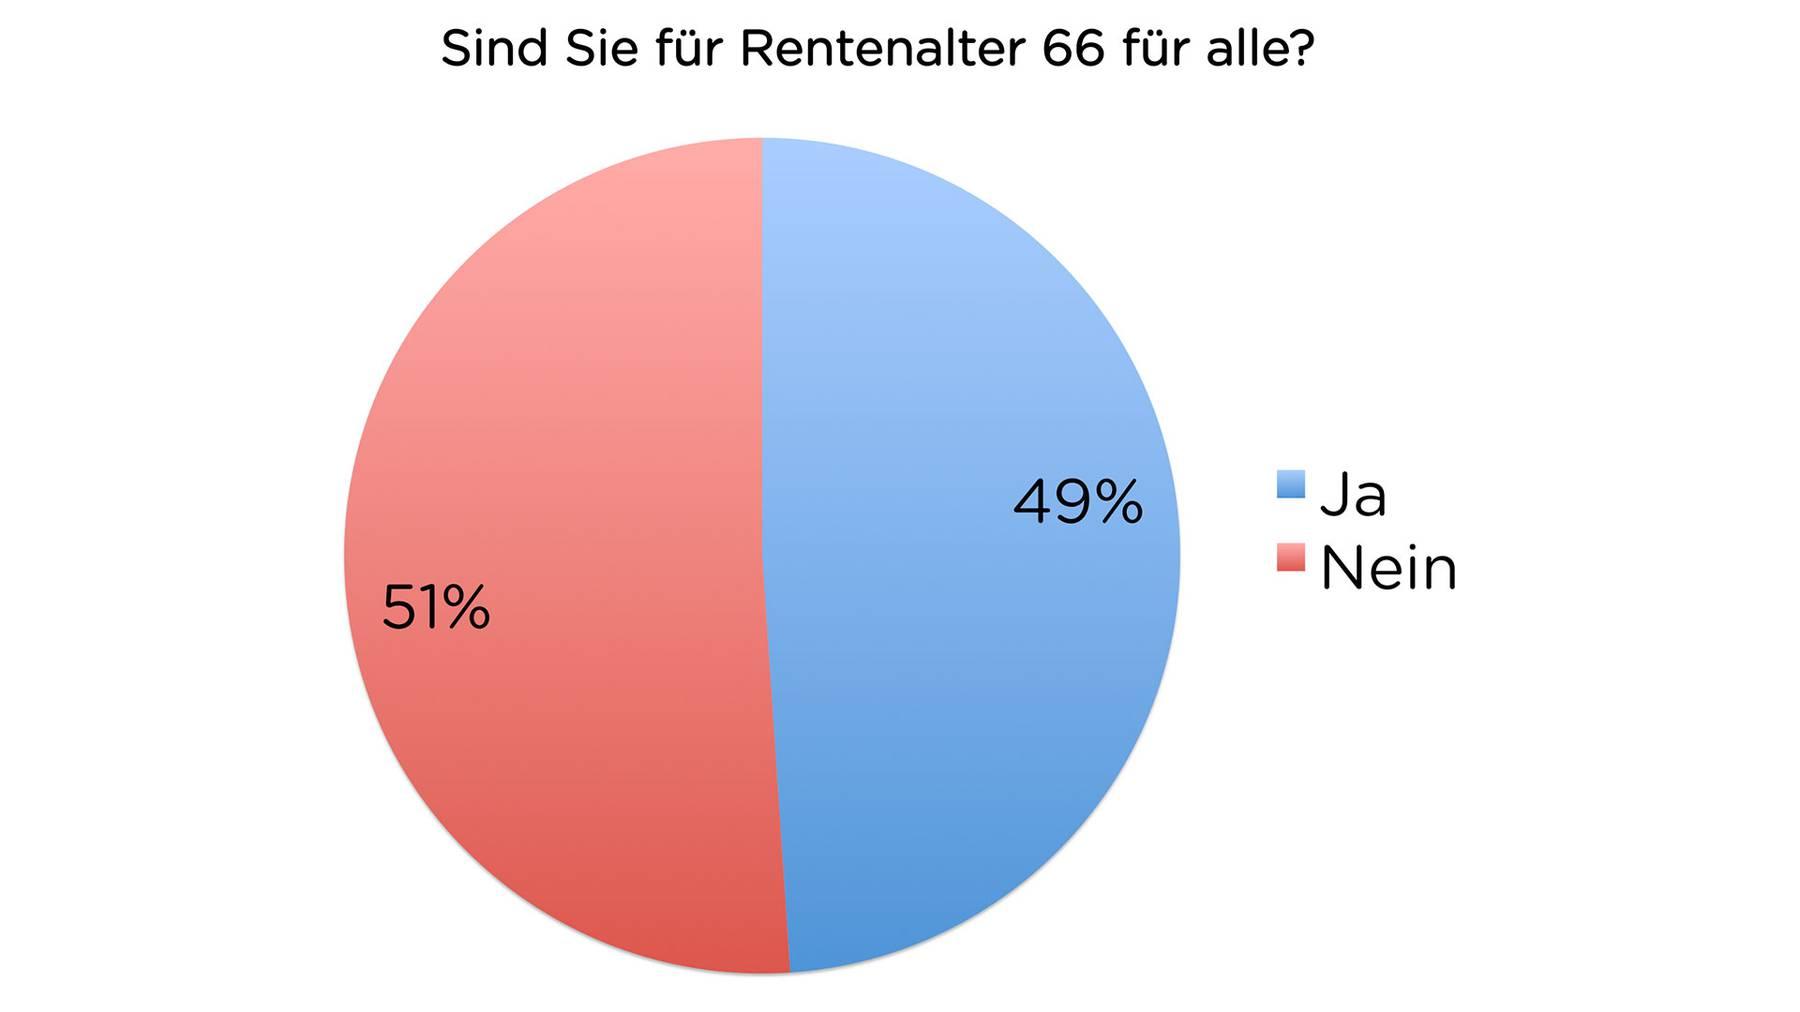 Rentenalter-Umfrage